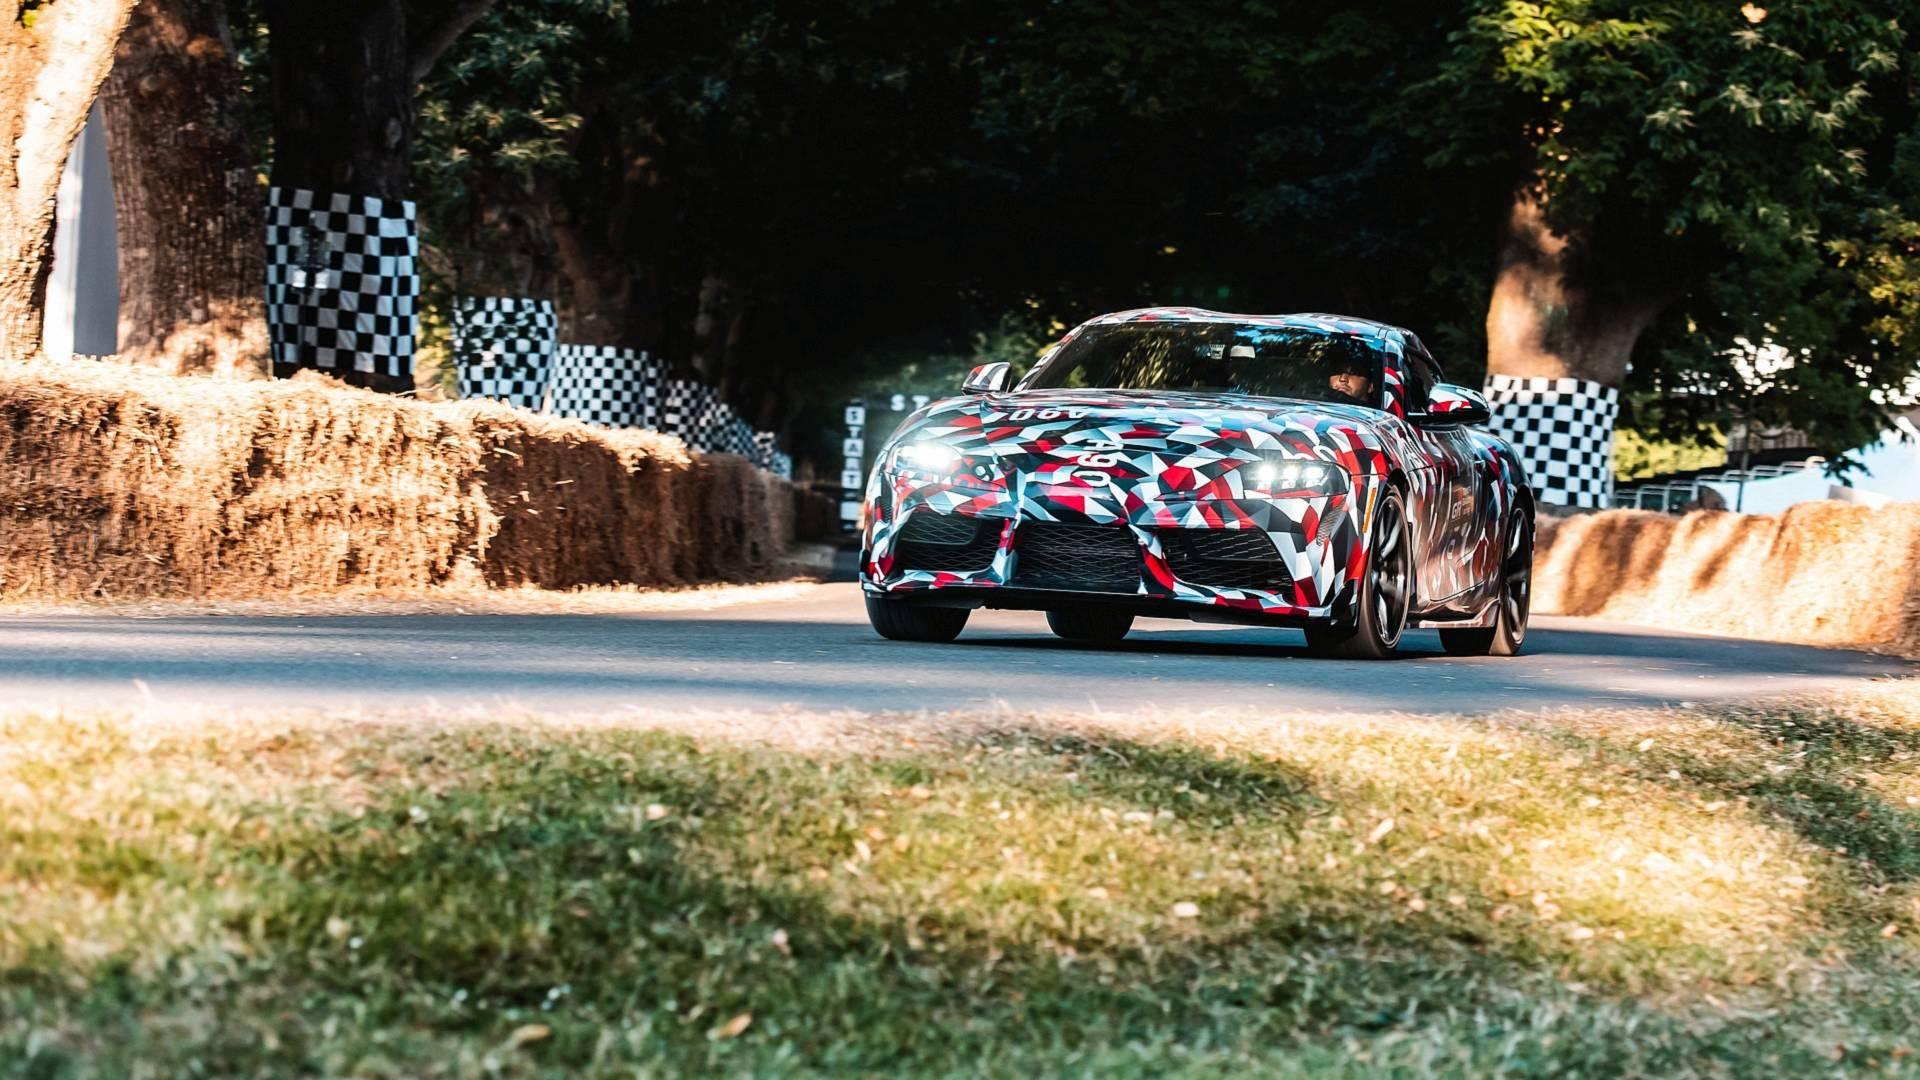 2019 Toyota Supra Interior Spied In Production Trim Shows